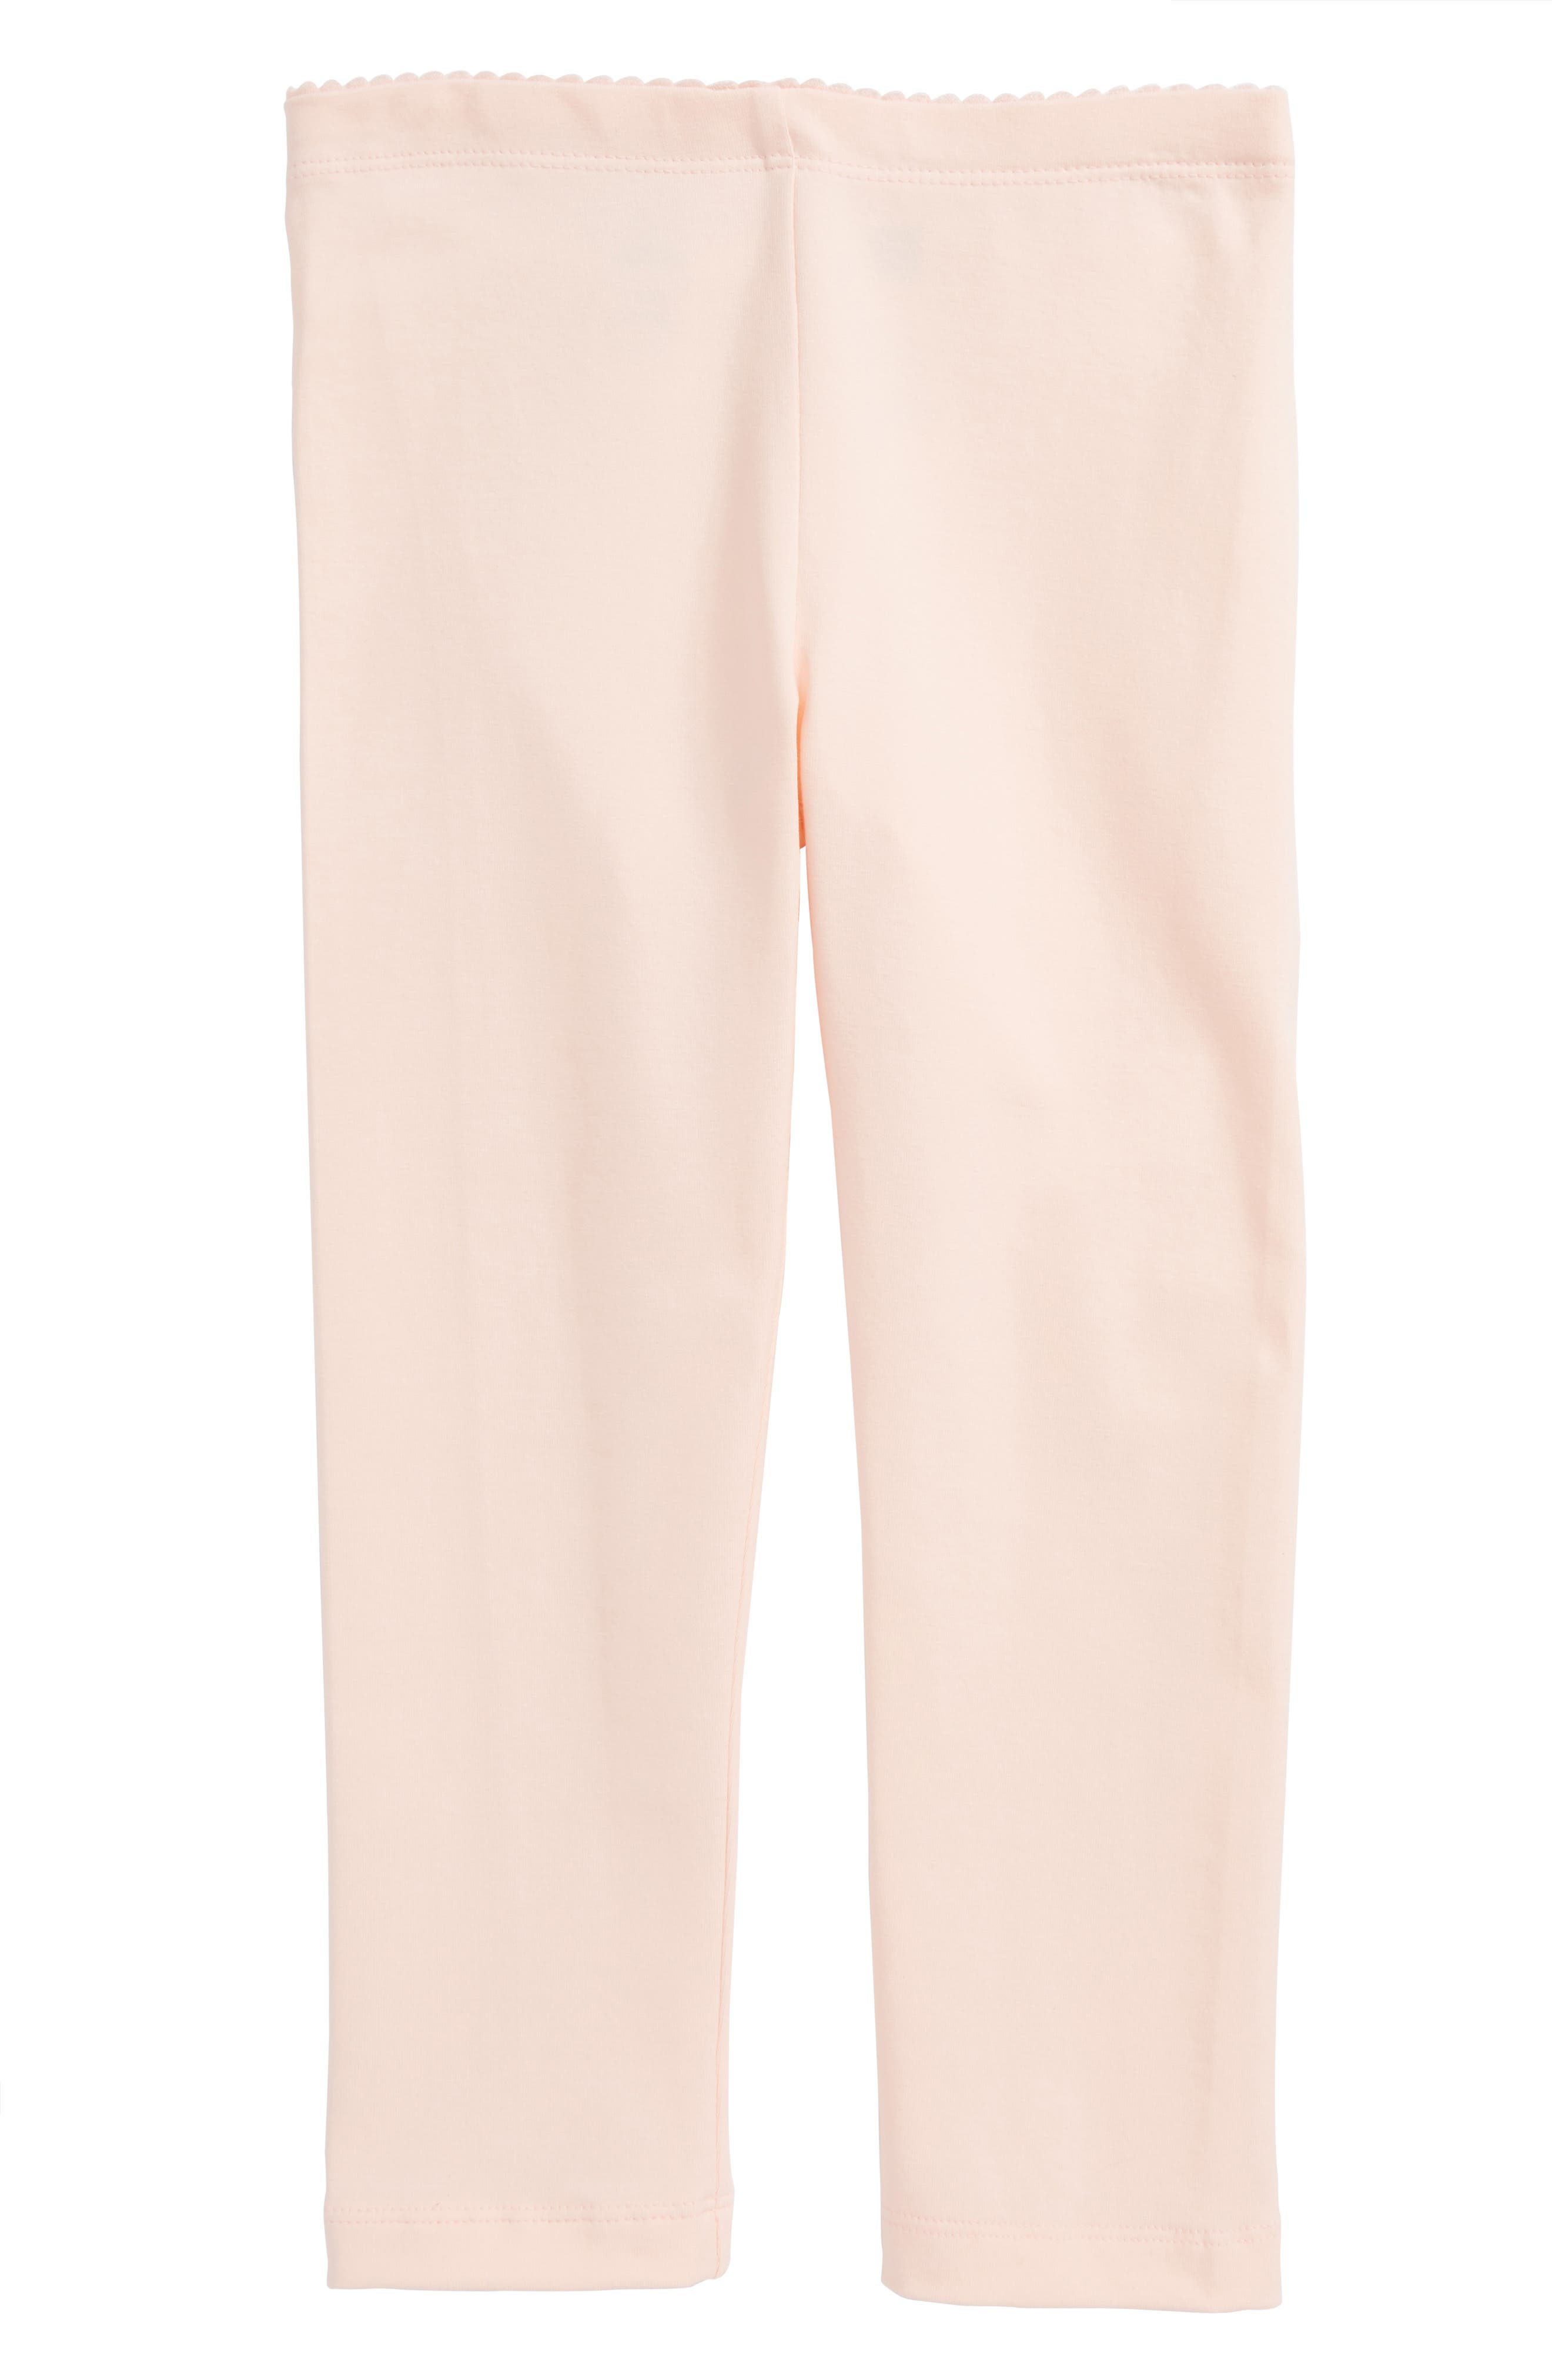 Capri Leggings,                             Main thumbnail 1, color,                             Pink Gloss